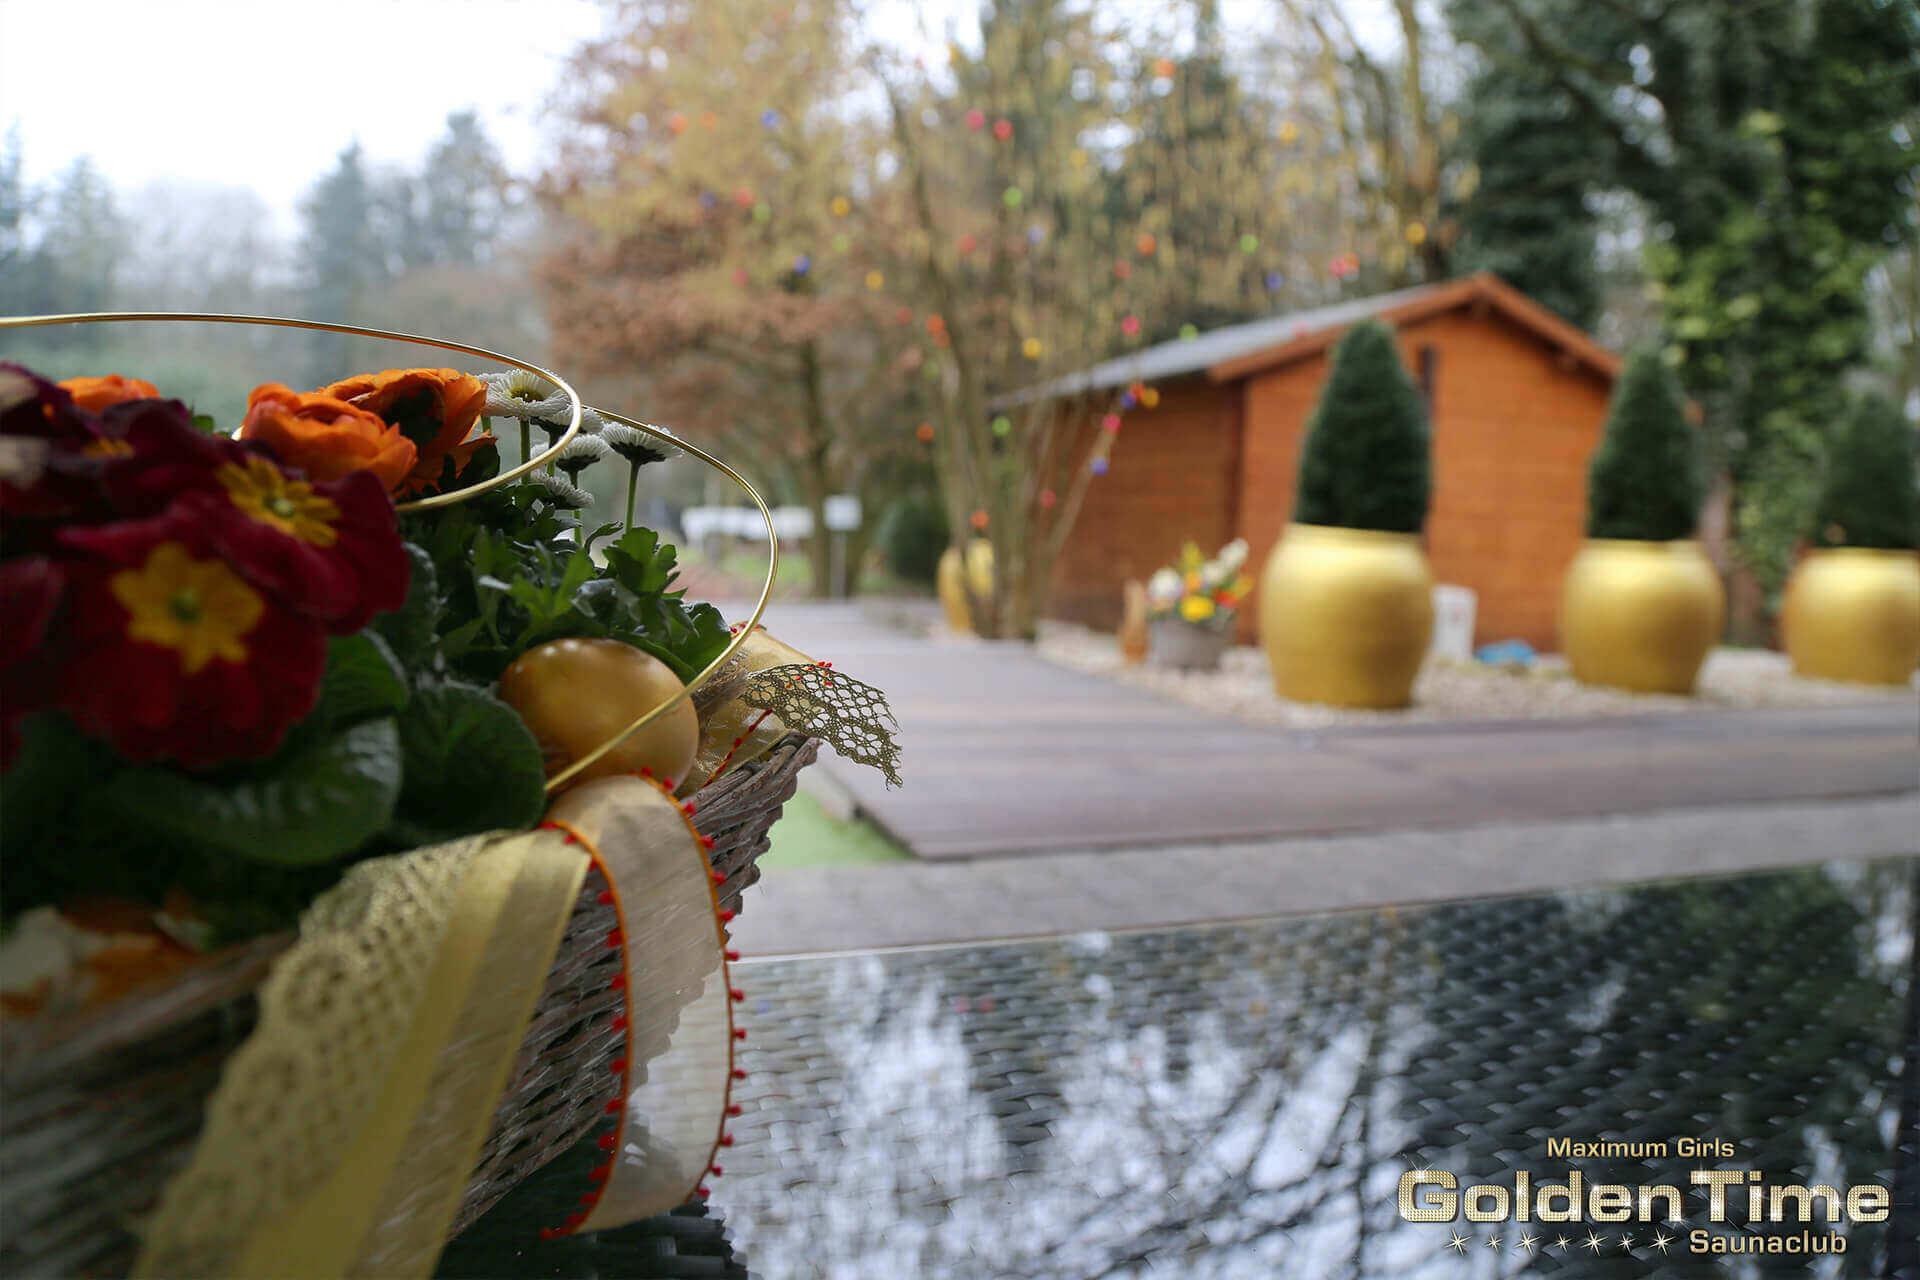 02-ostern-2016-pic-16-goldentime-saunaclub.jpg